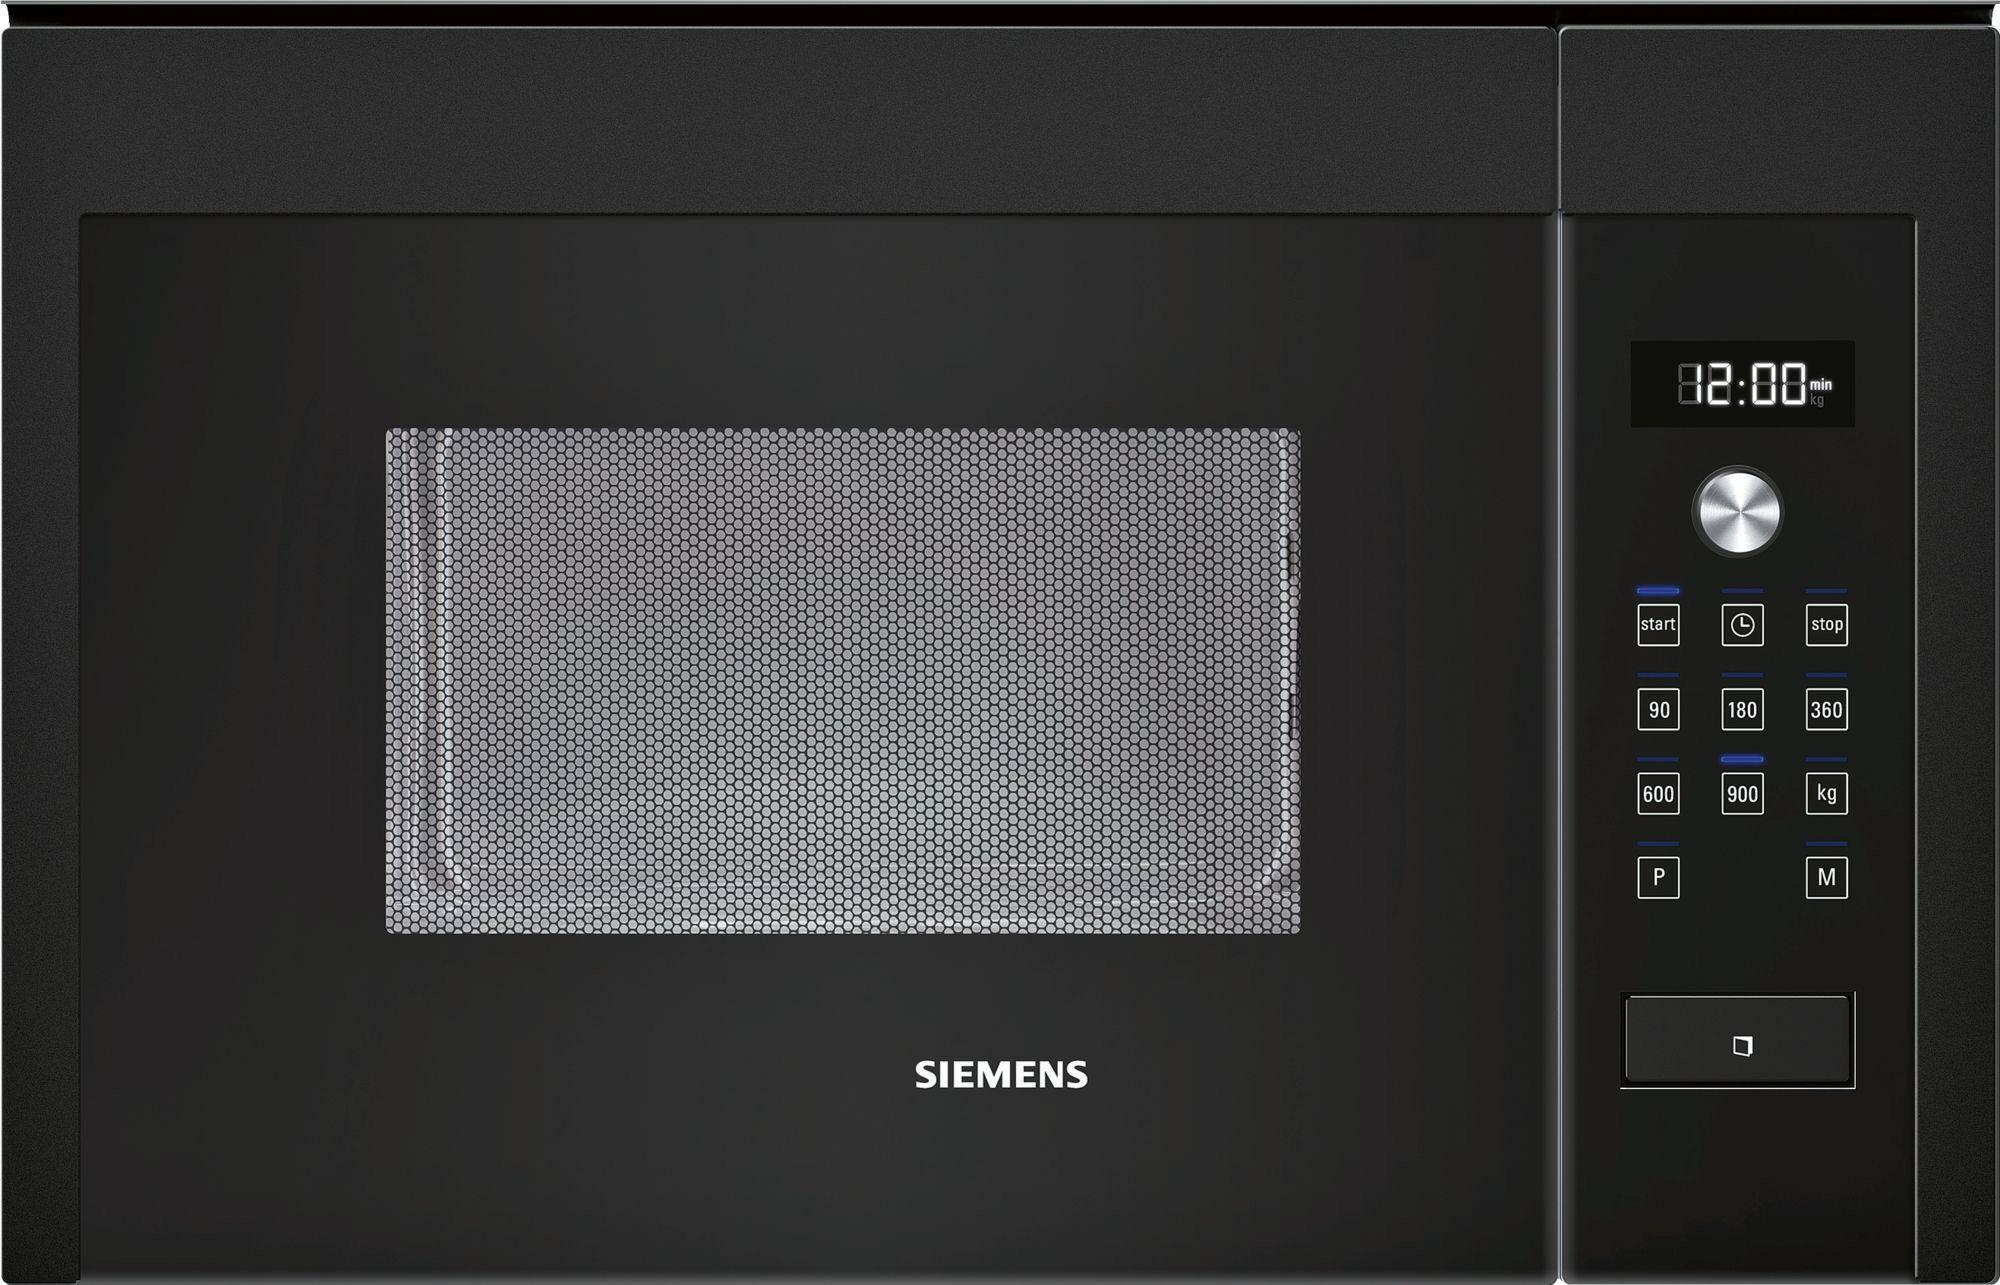 microgolfoven enkel microgolven (inbouw) Siemens HF24M664 microgolfoven enkel microgolven (inbouw) HF 24M664 HF 24 M 664